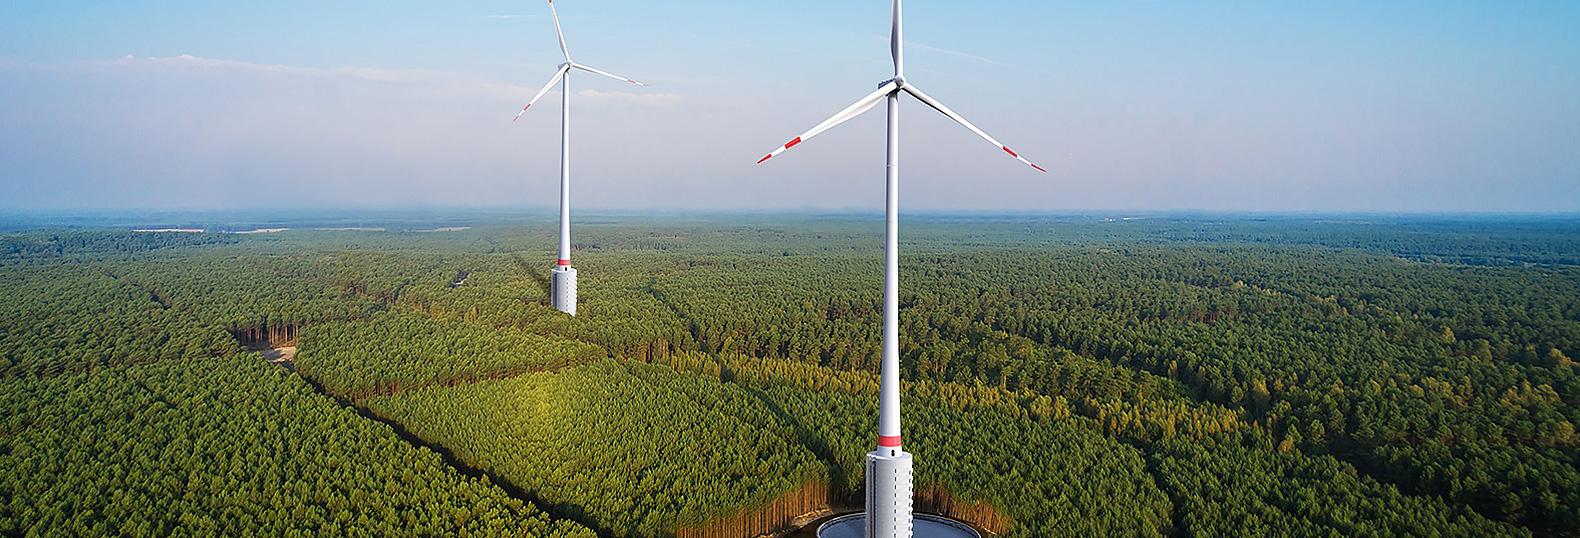 wind-hydro-combination-plant-full-width-tall